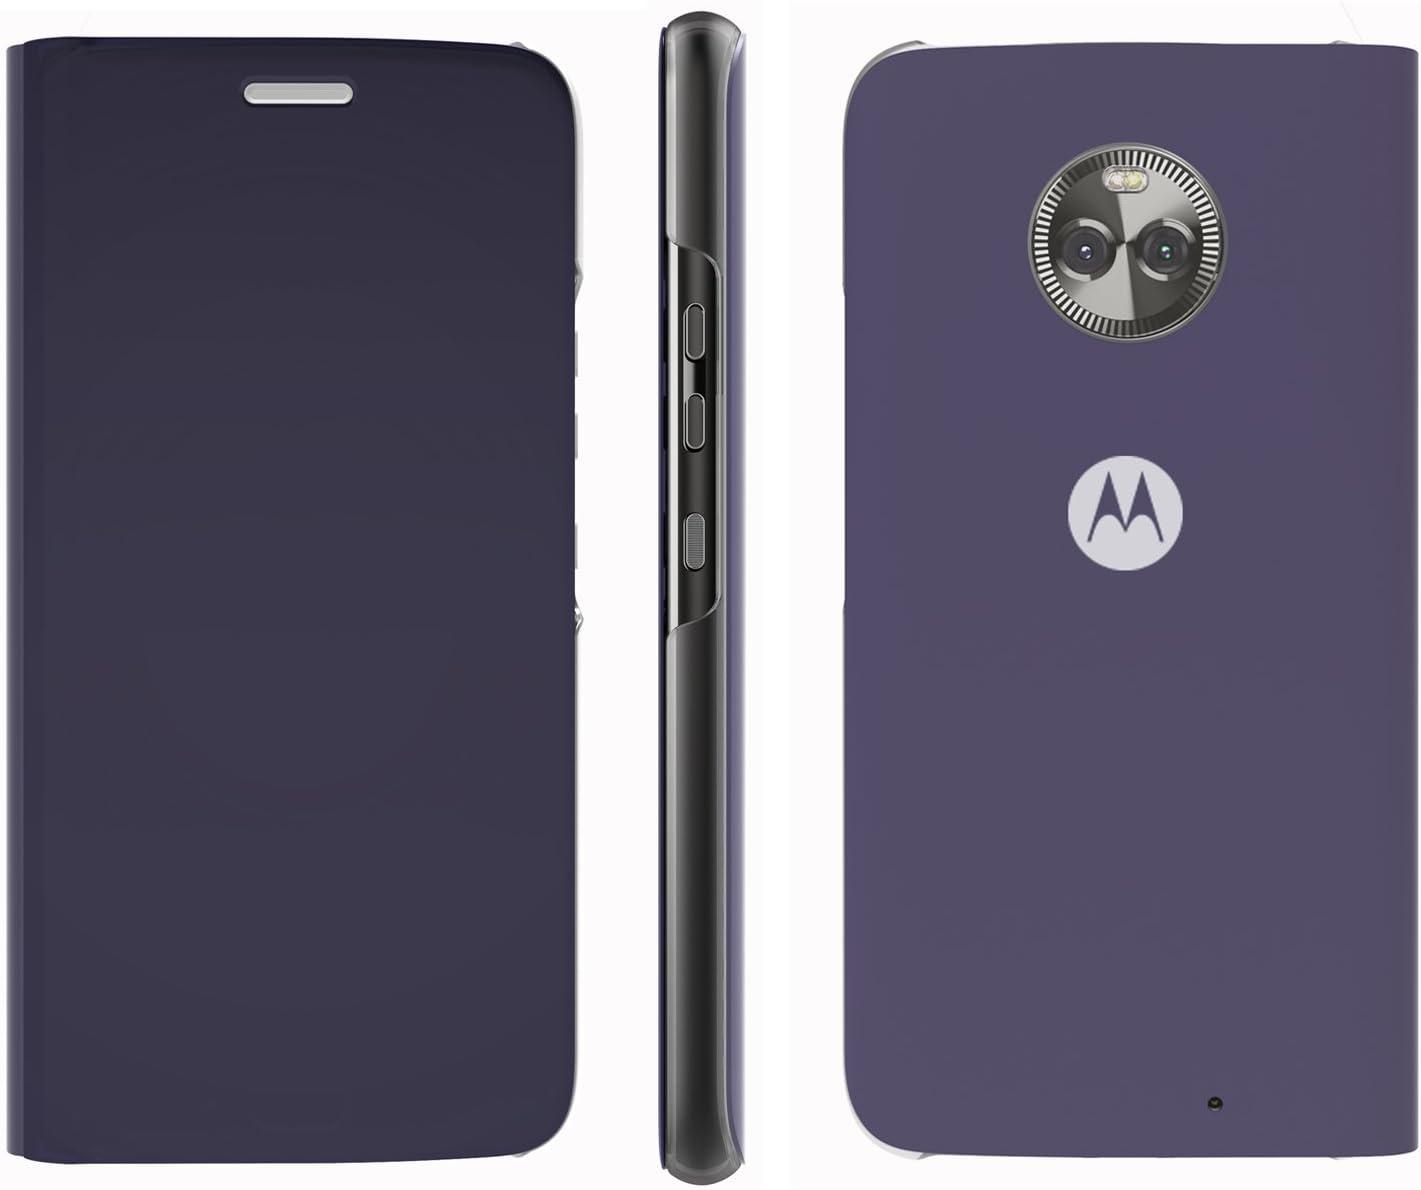 Lenovo Moto X4 Flip Case, Touch Flip Cover Transparent Shell Shock Resistant and Edge Protective Folio Flip Case for Motorola Moto X4 (Blue)